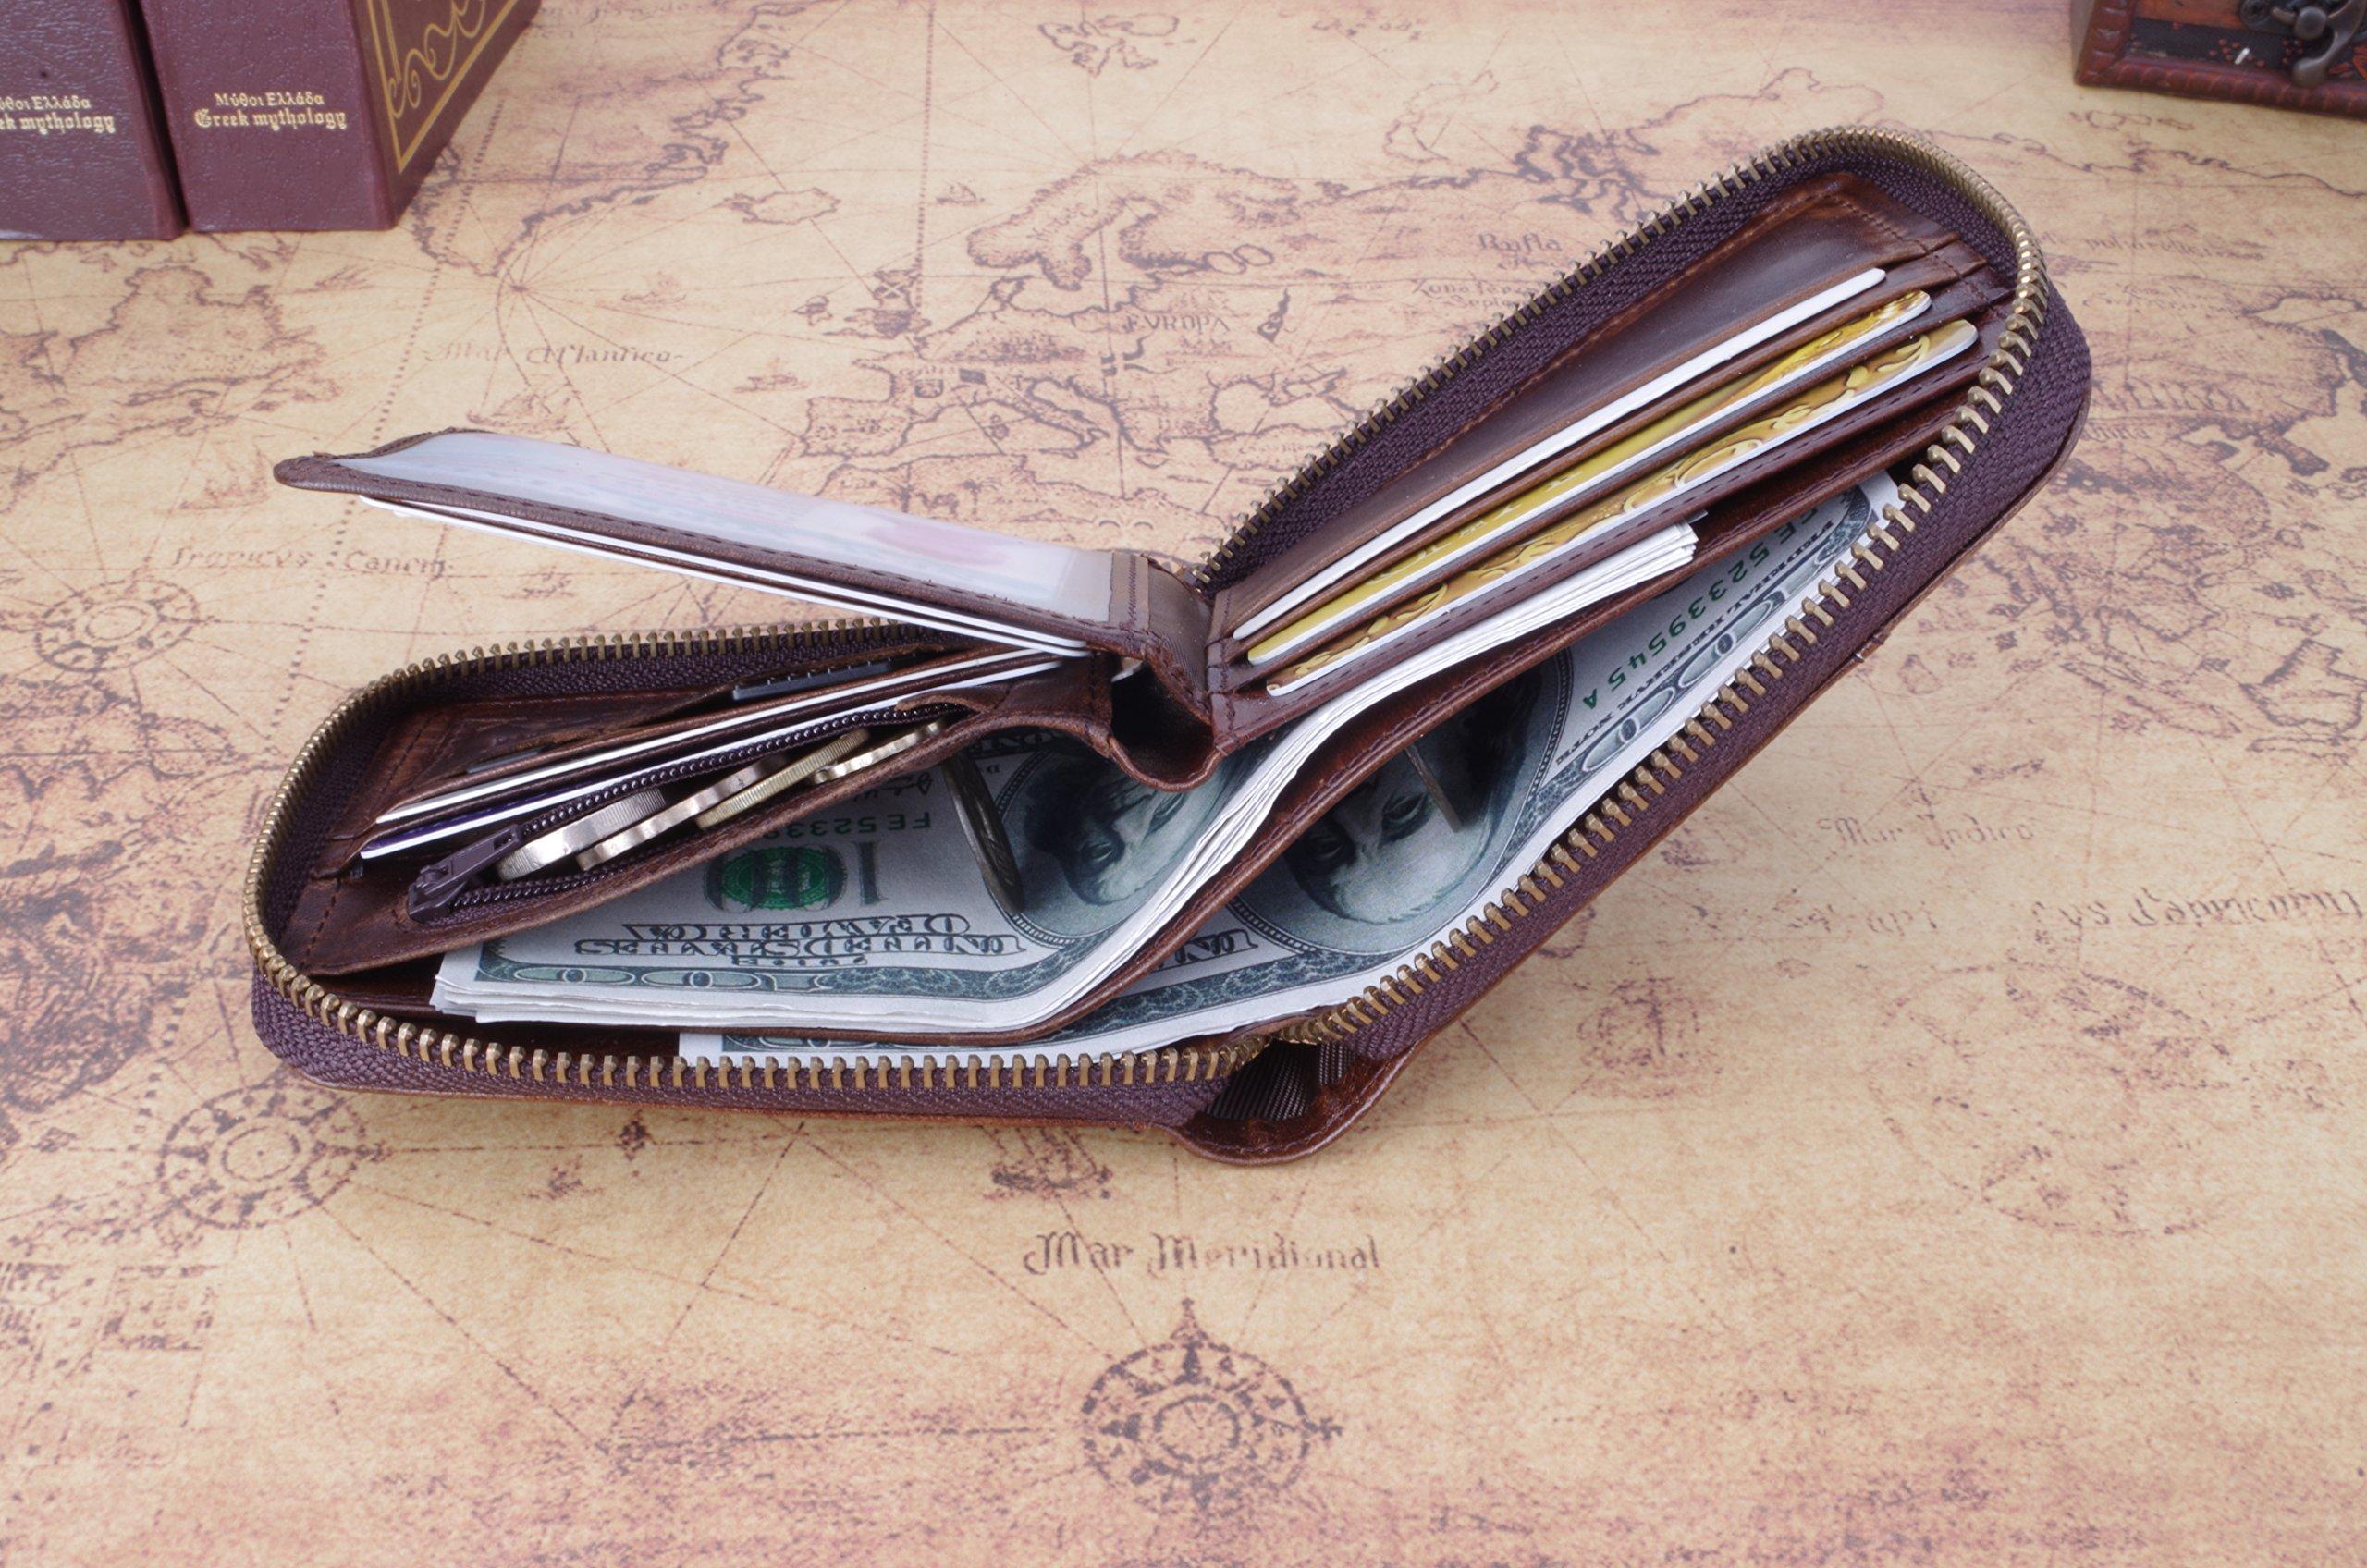 Admetus Men's Genuine Leather Short Zip-around Bifold Wallet (brown) by Admetus (Image #4)